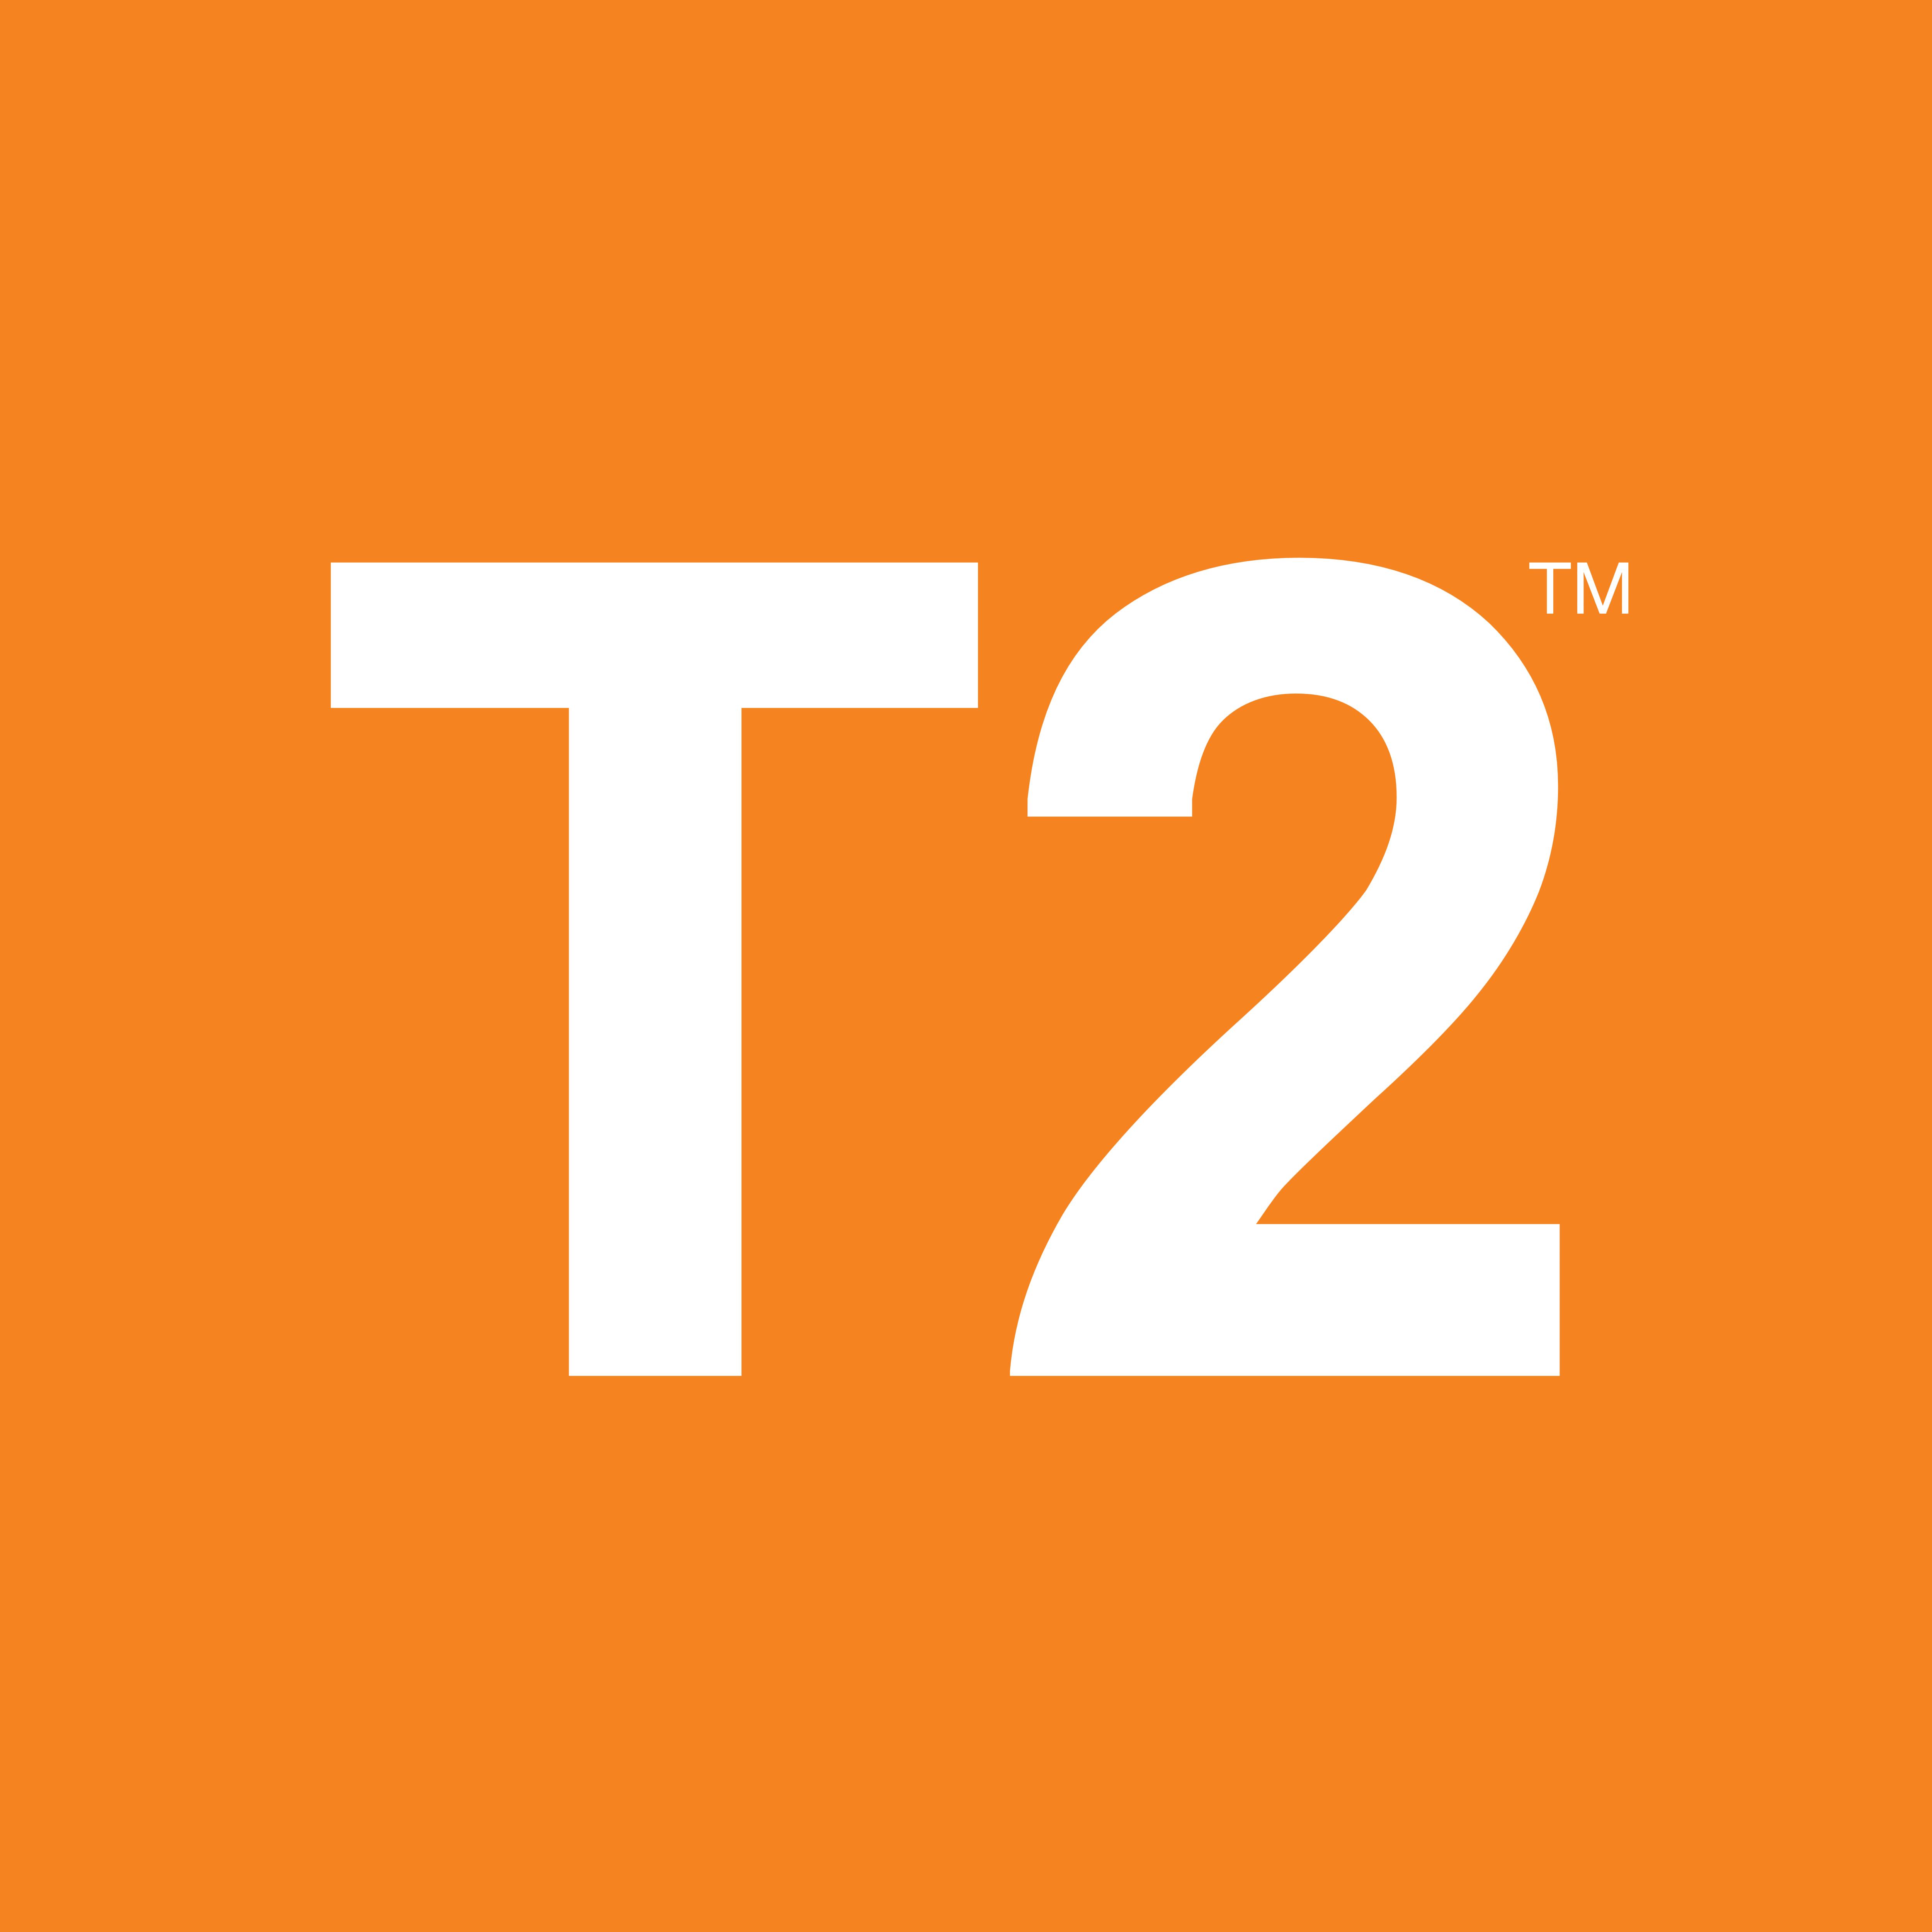 t2 tea logos download vector creator software vector creator free